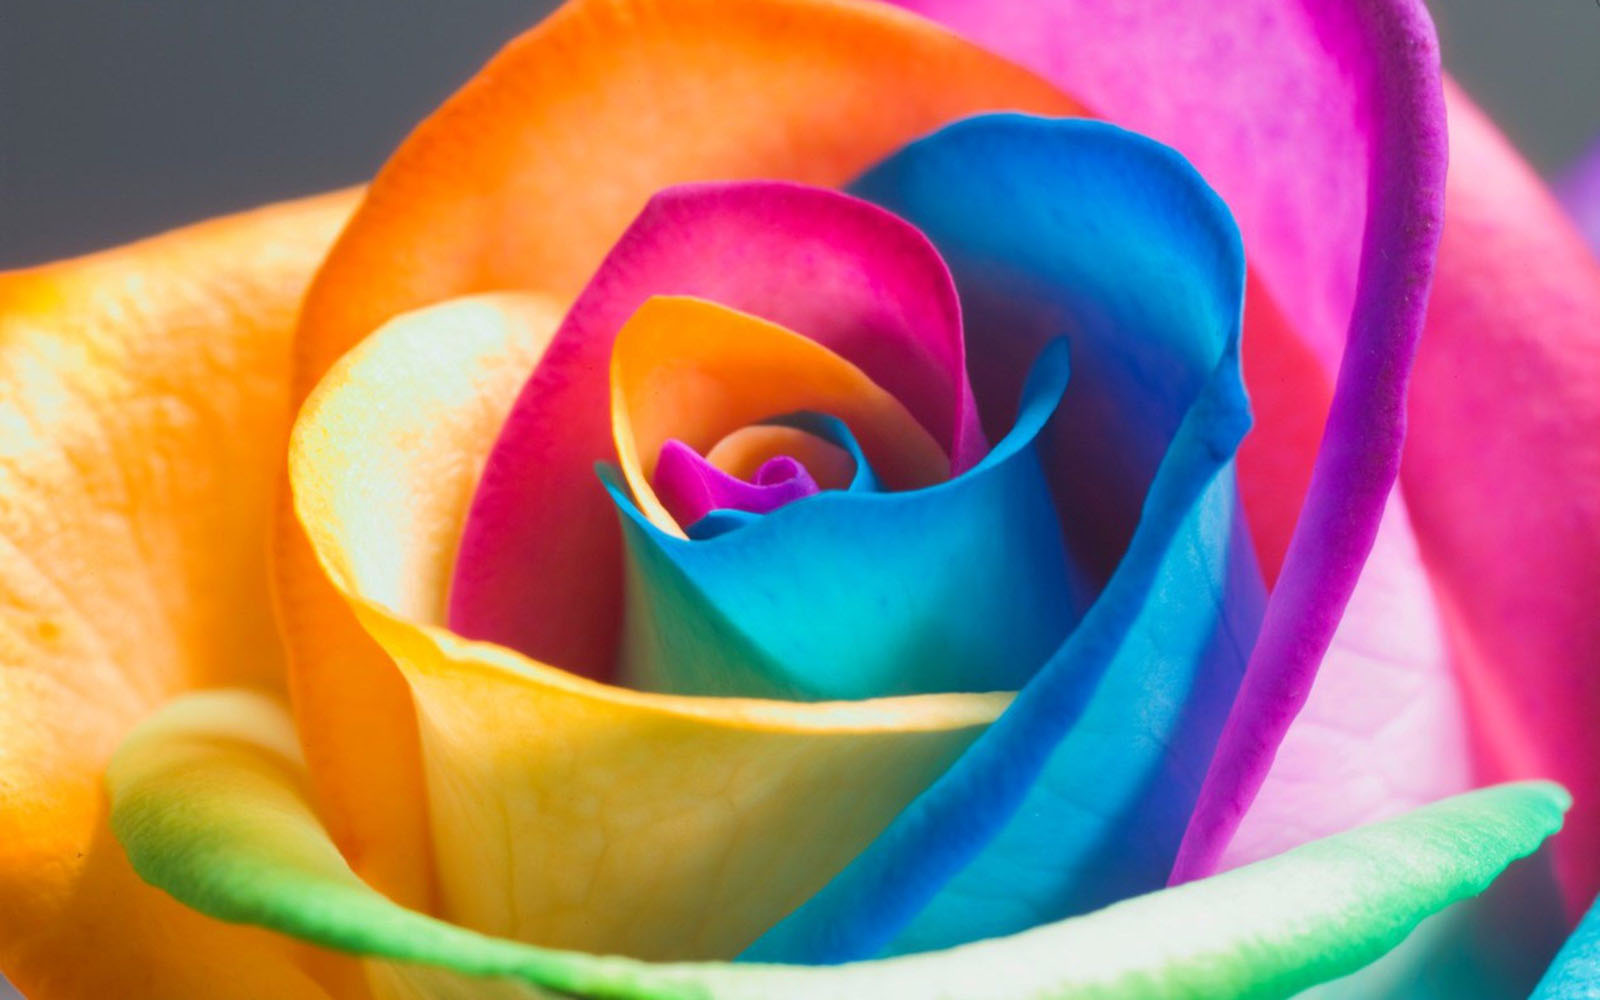 colorful flower wallpaper colorful flower desktop wallpaper colorful 1600x1000